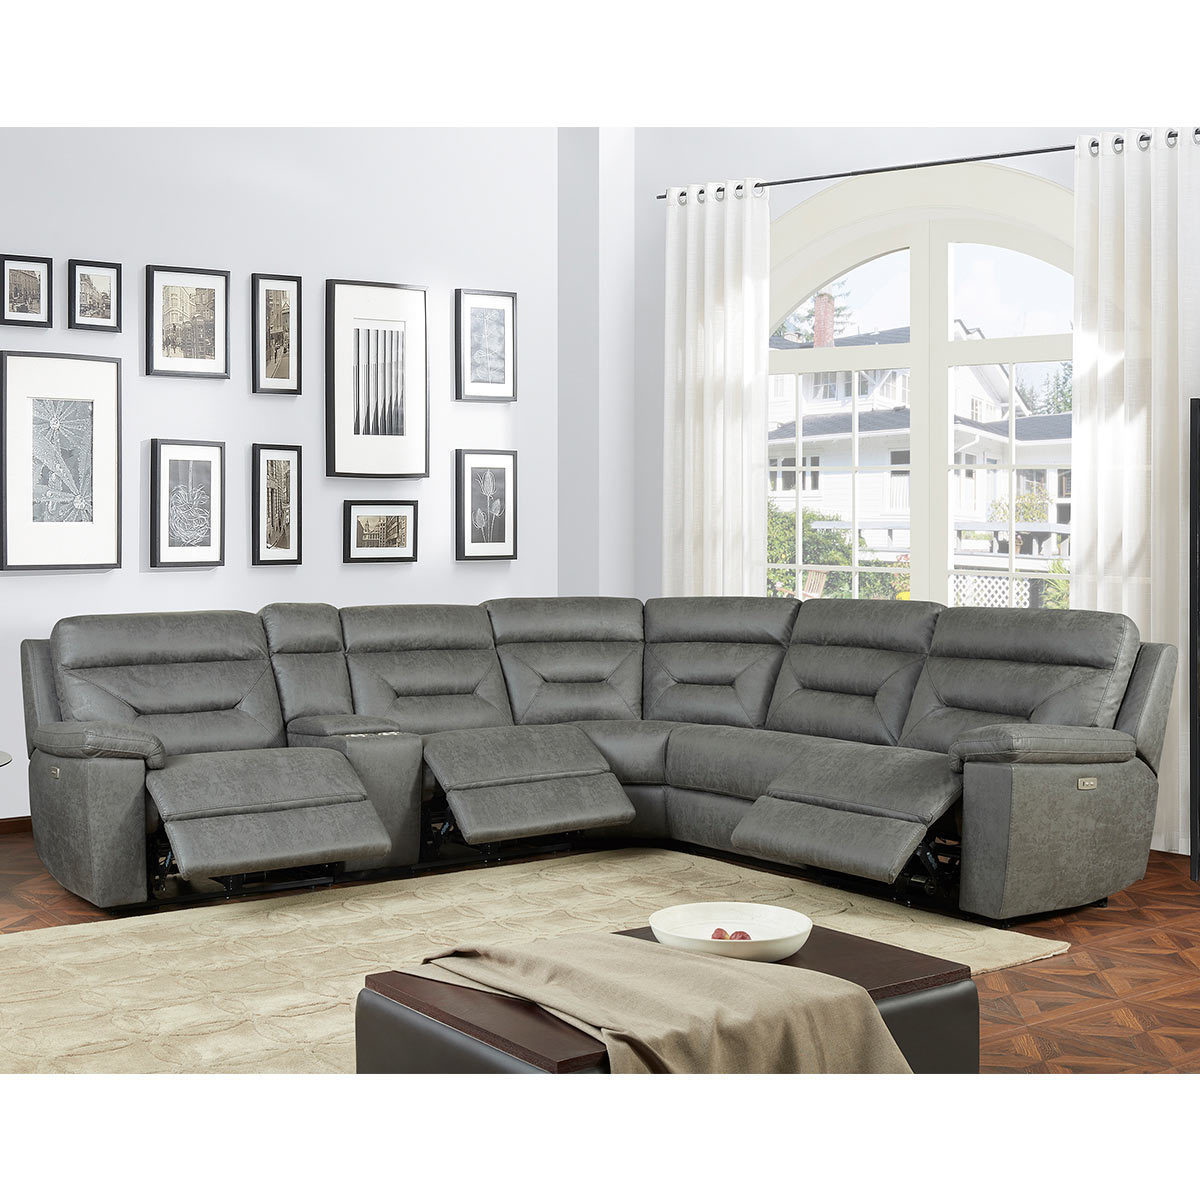 kuka justin grey fabric power reclining sectional sofa costco uk